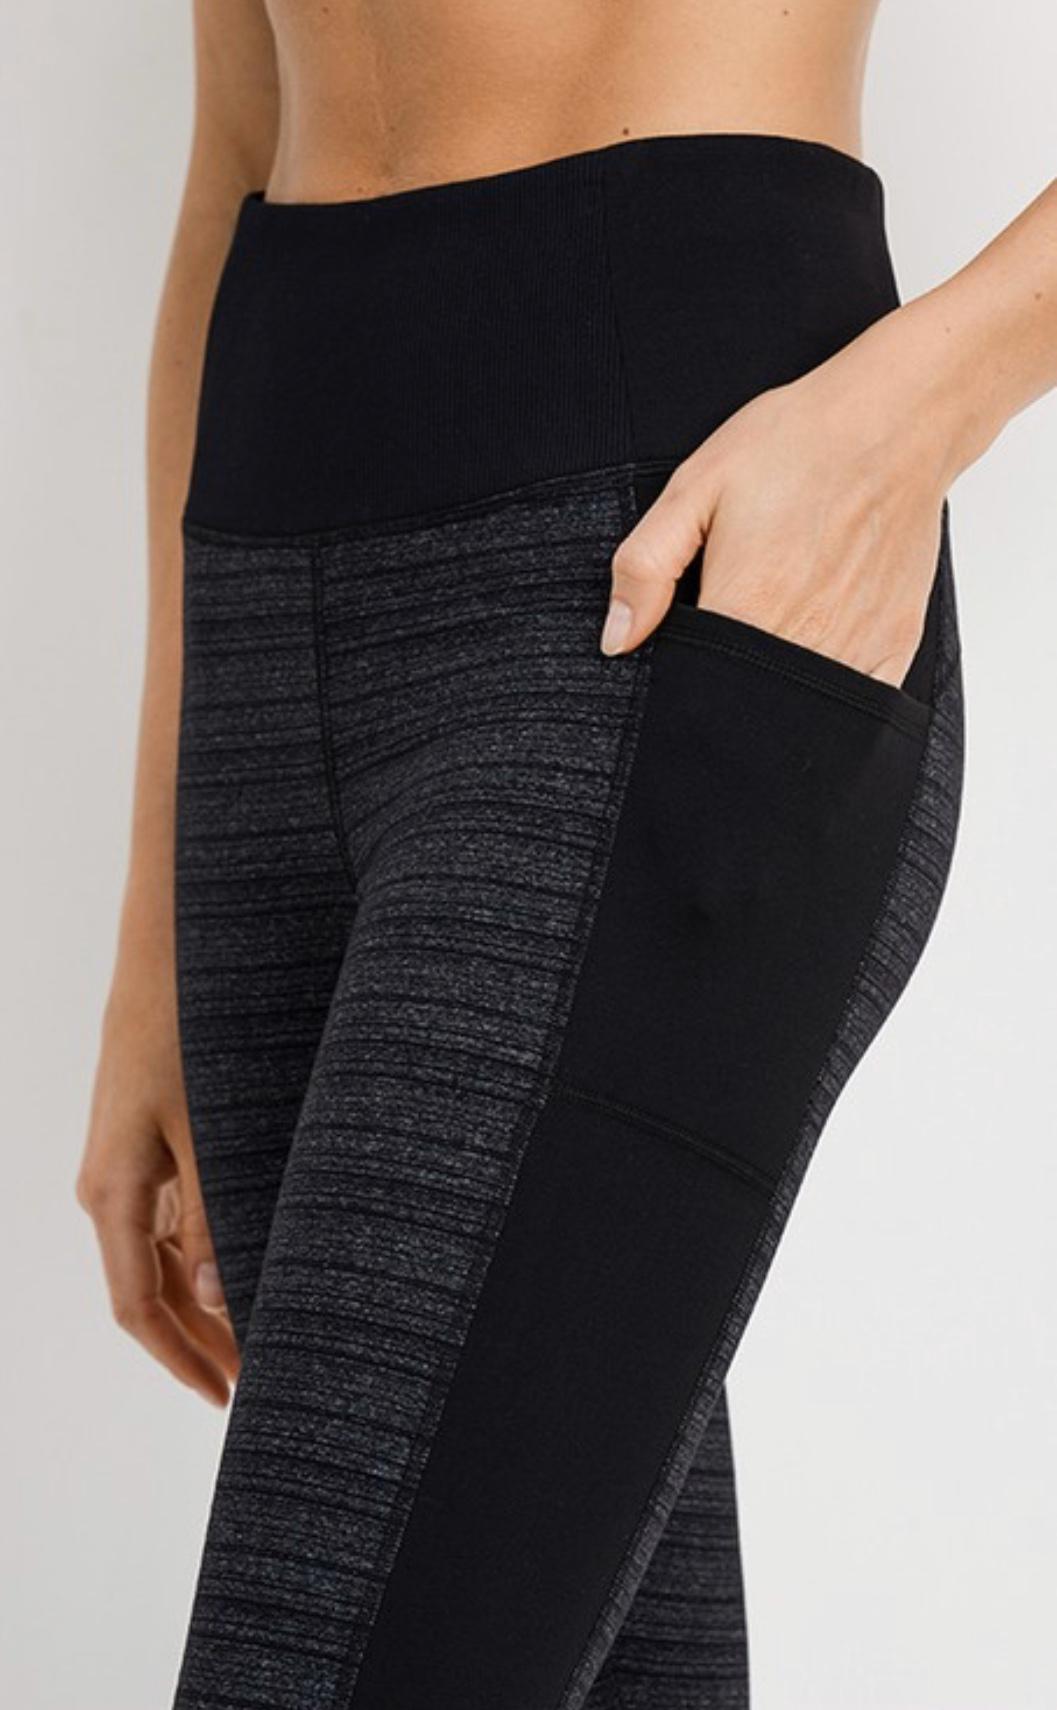 Athletic Legging - Heathered Grey/Black with Bottom Cuff